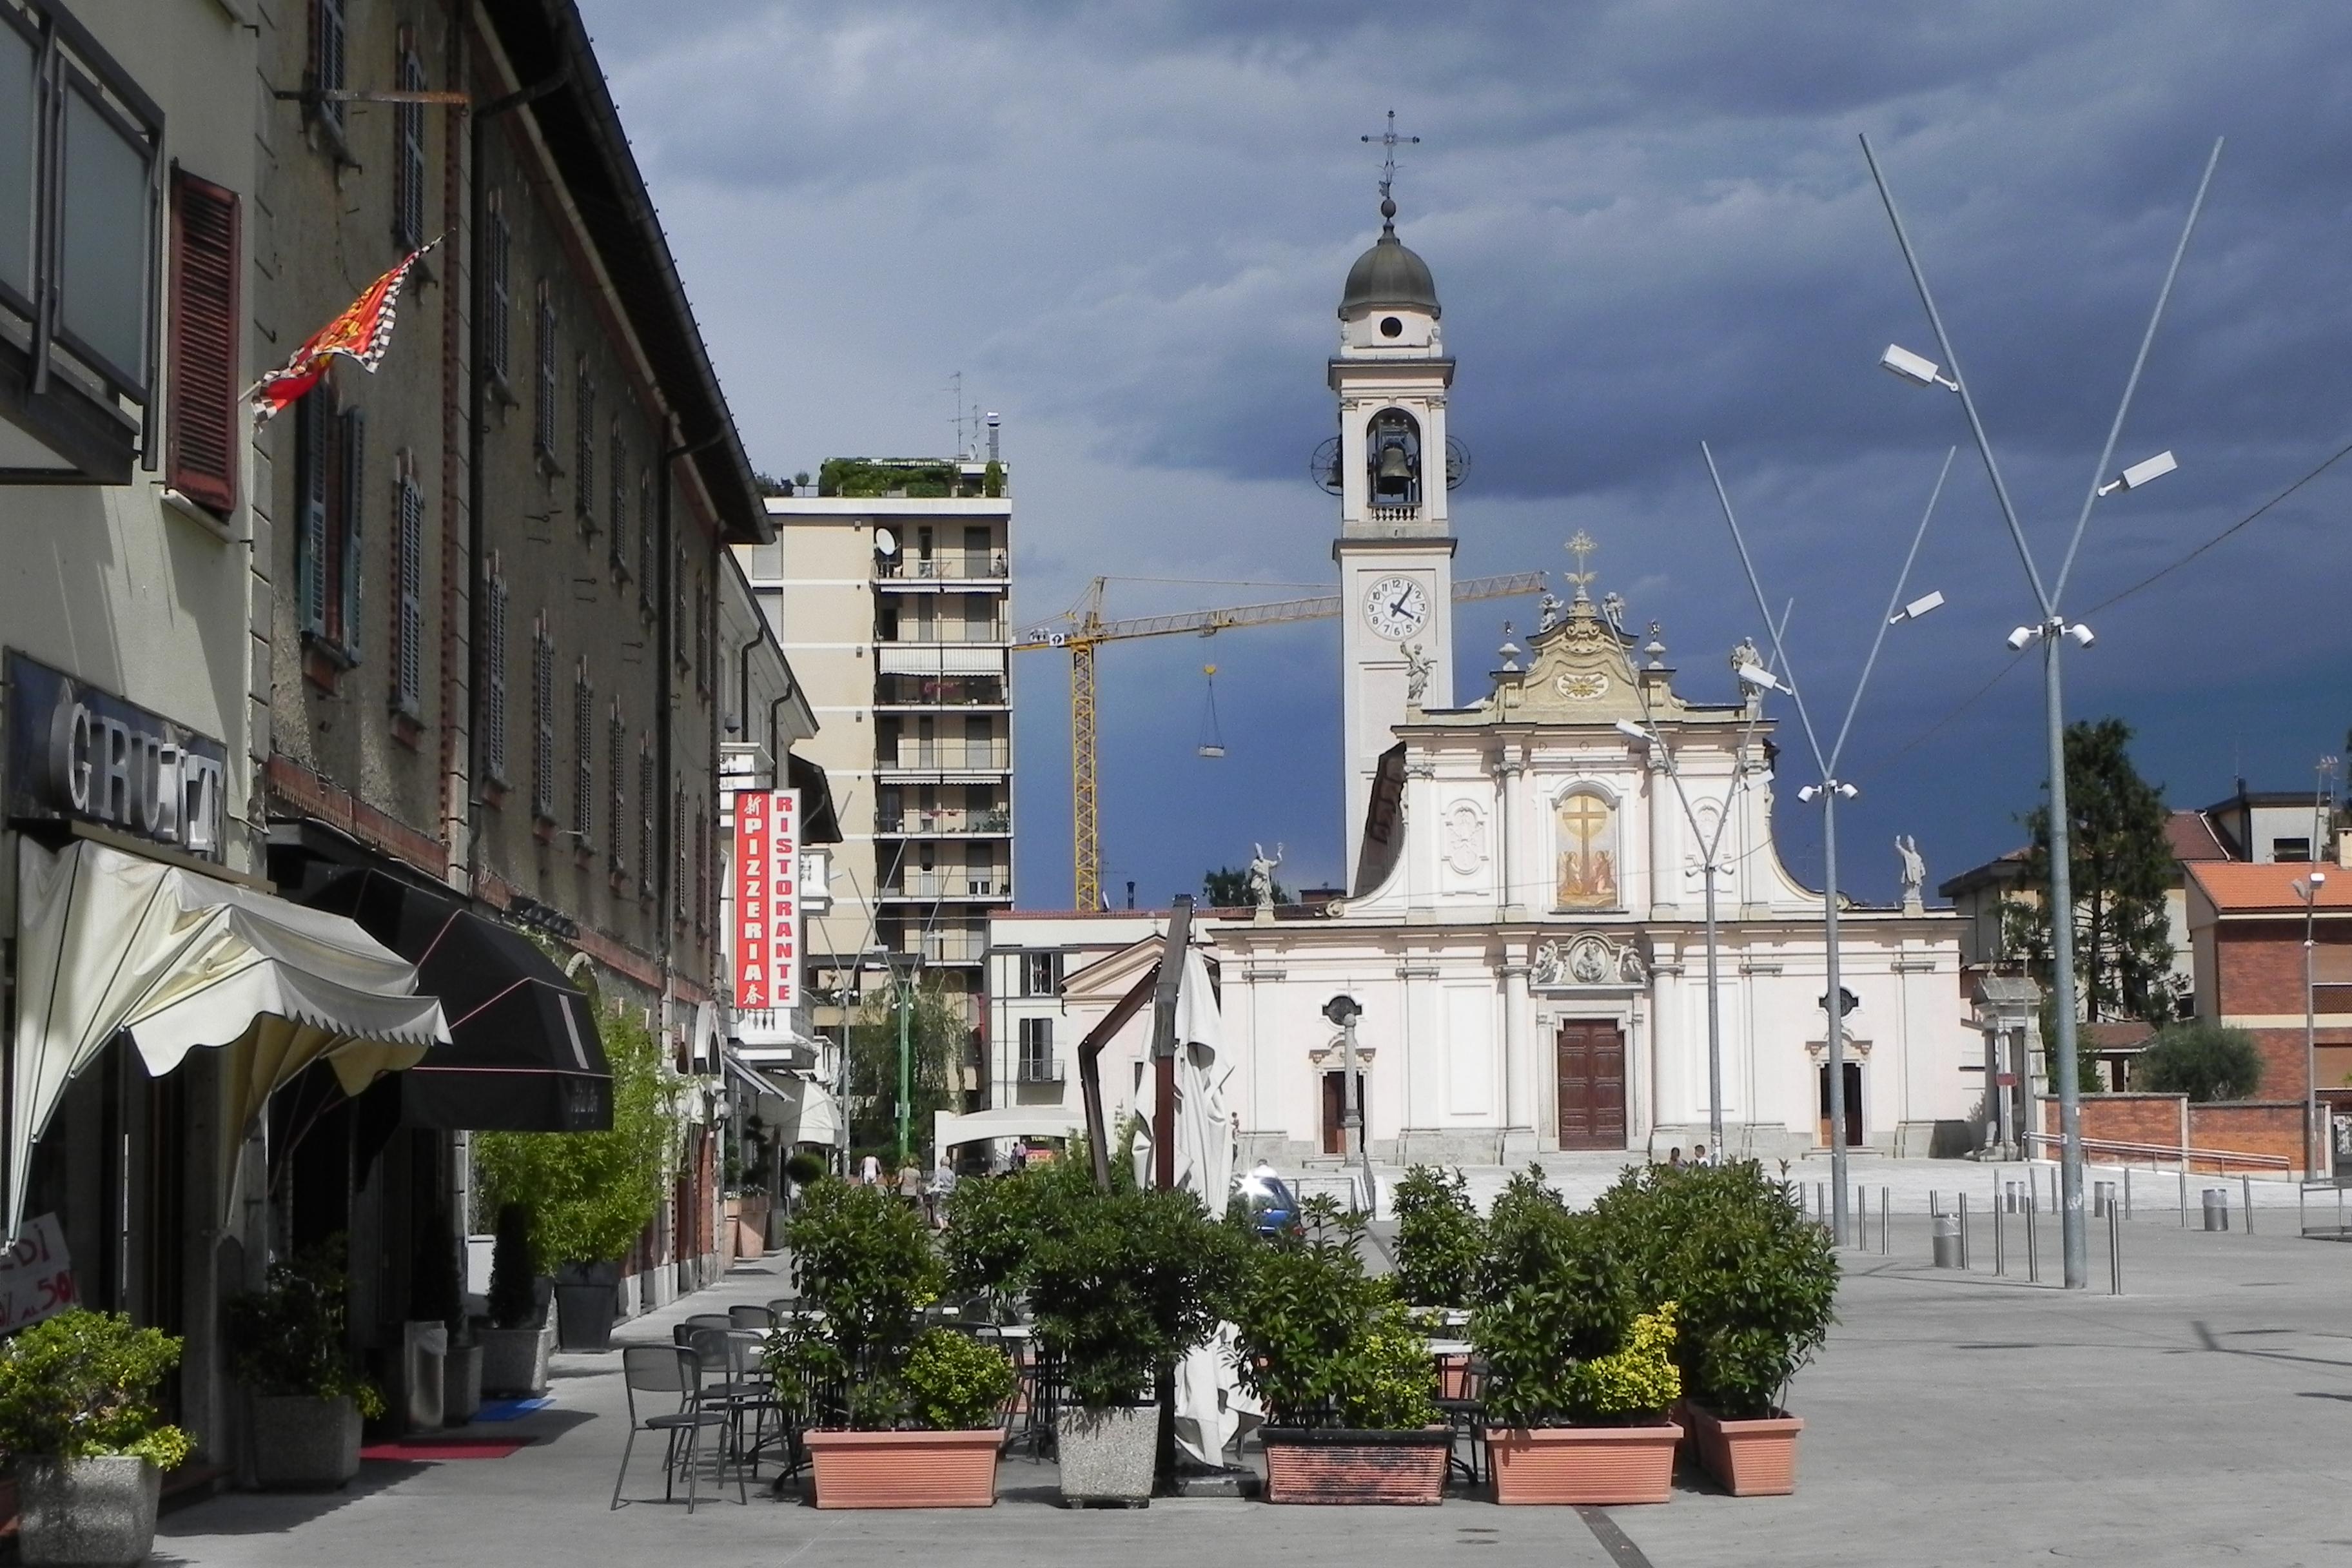 Cinisello Balsamo Italy  city photo : Piazza Gramsci e la chiesa di Cinisello Balsamo, Italy